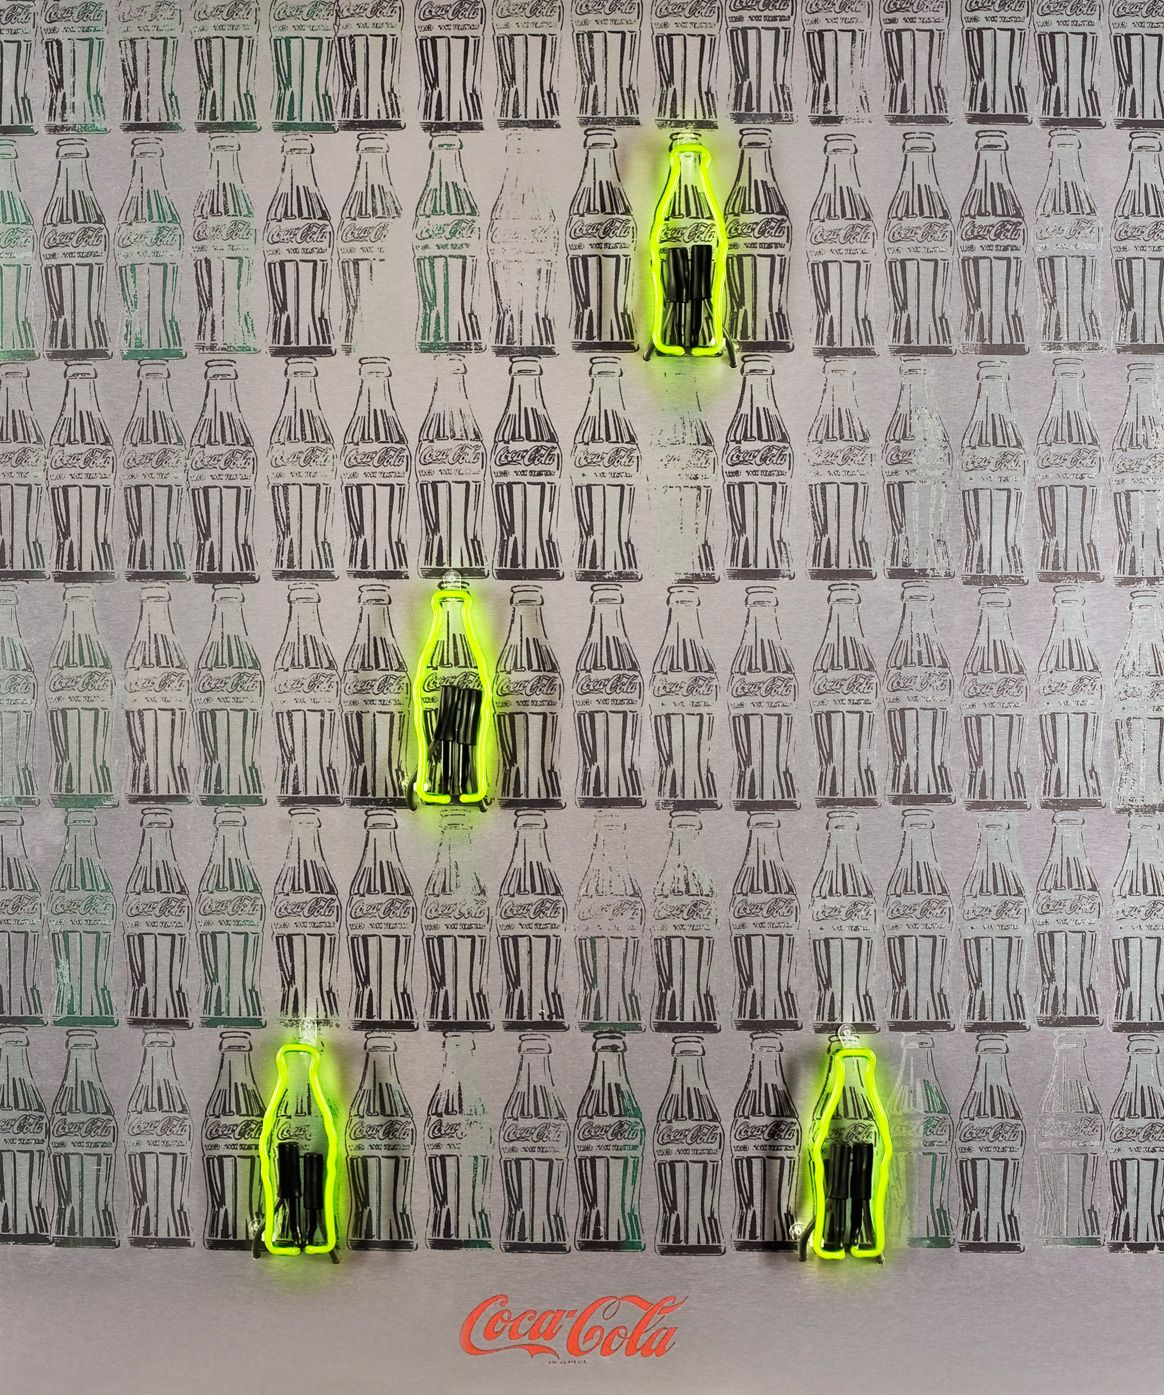 product photography / Joanna Kata neon artwork / Martin Komischke